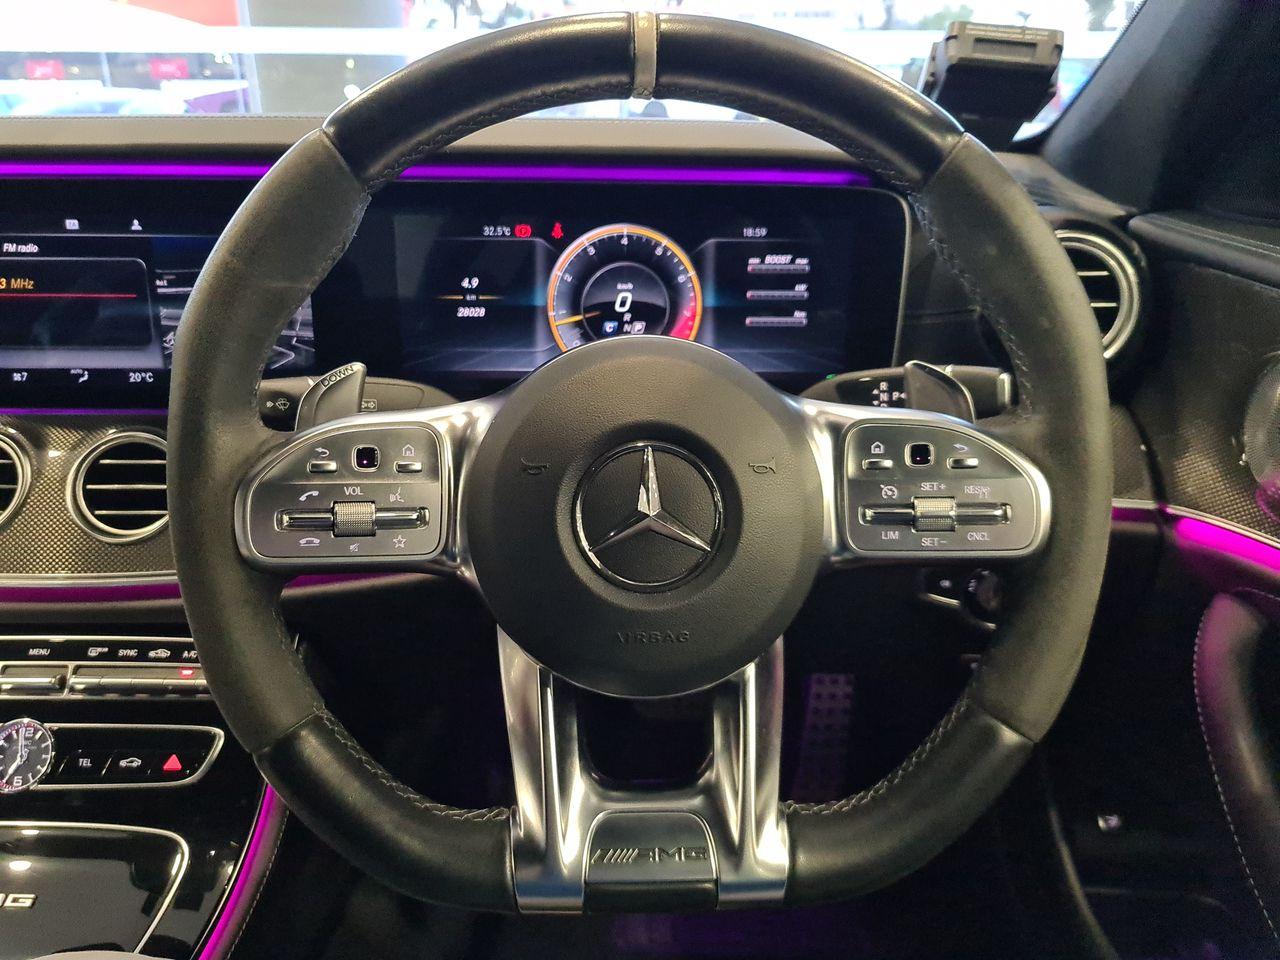 Mercedes Benz AMG E63 S 4MATIC+ (R20 LED SR)